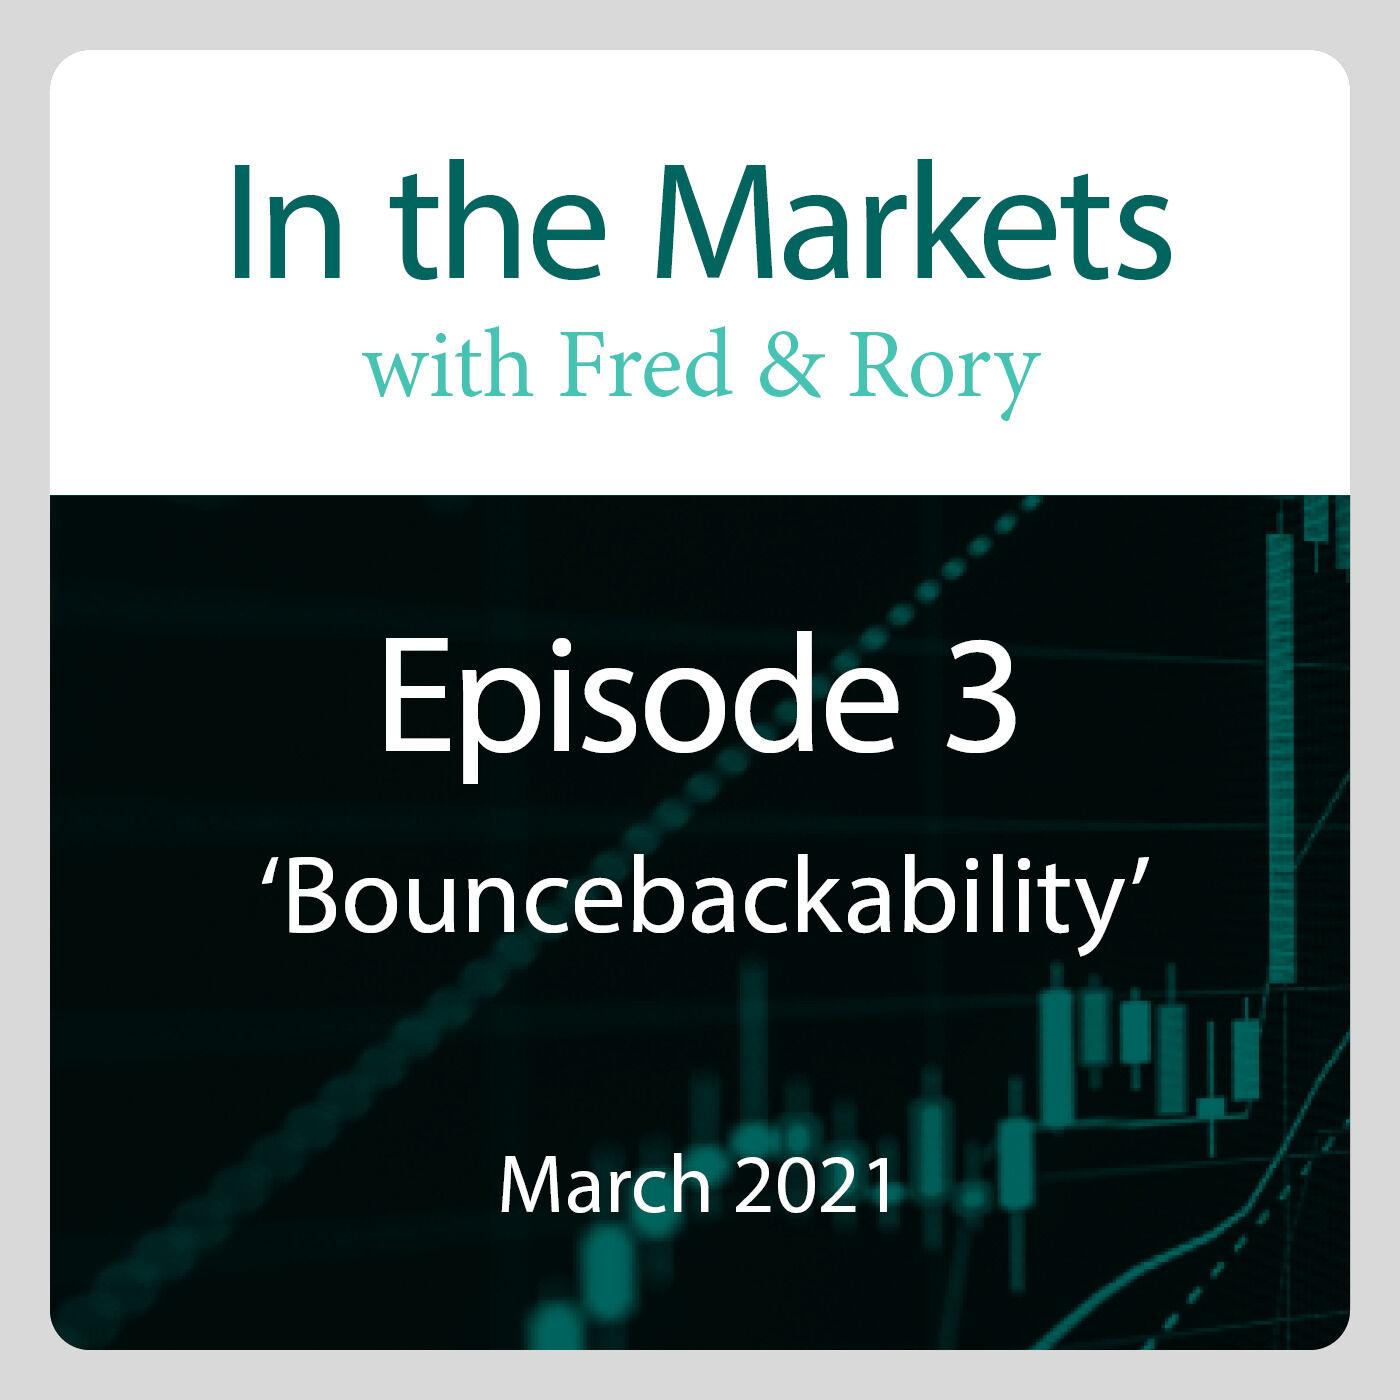 March 2021: JD Sports, UK Budget and Bouncebackability